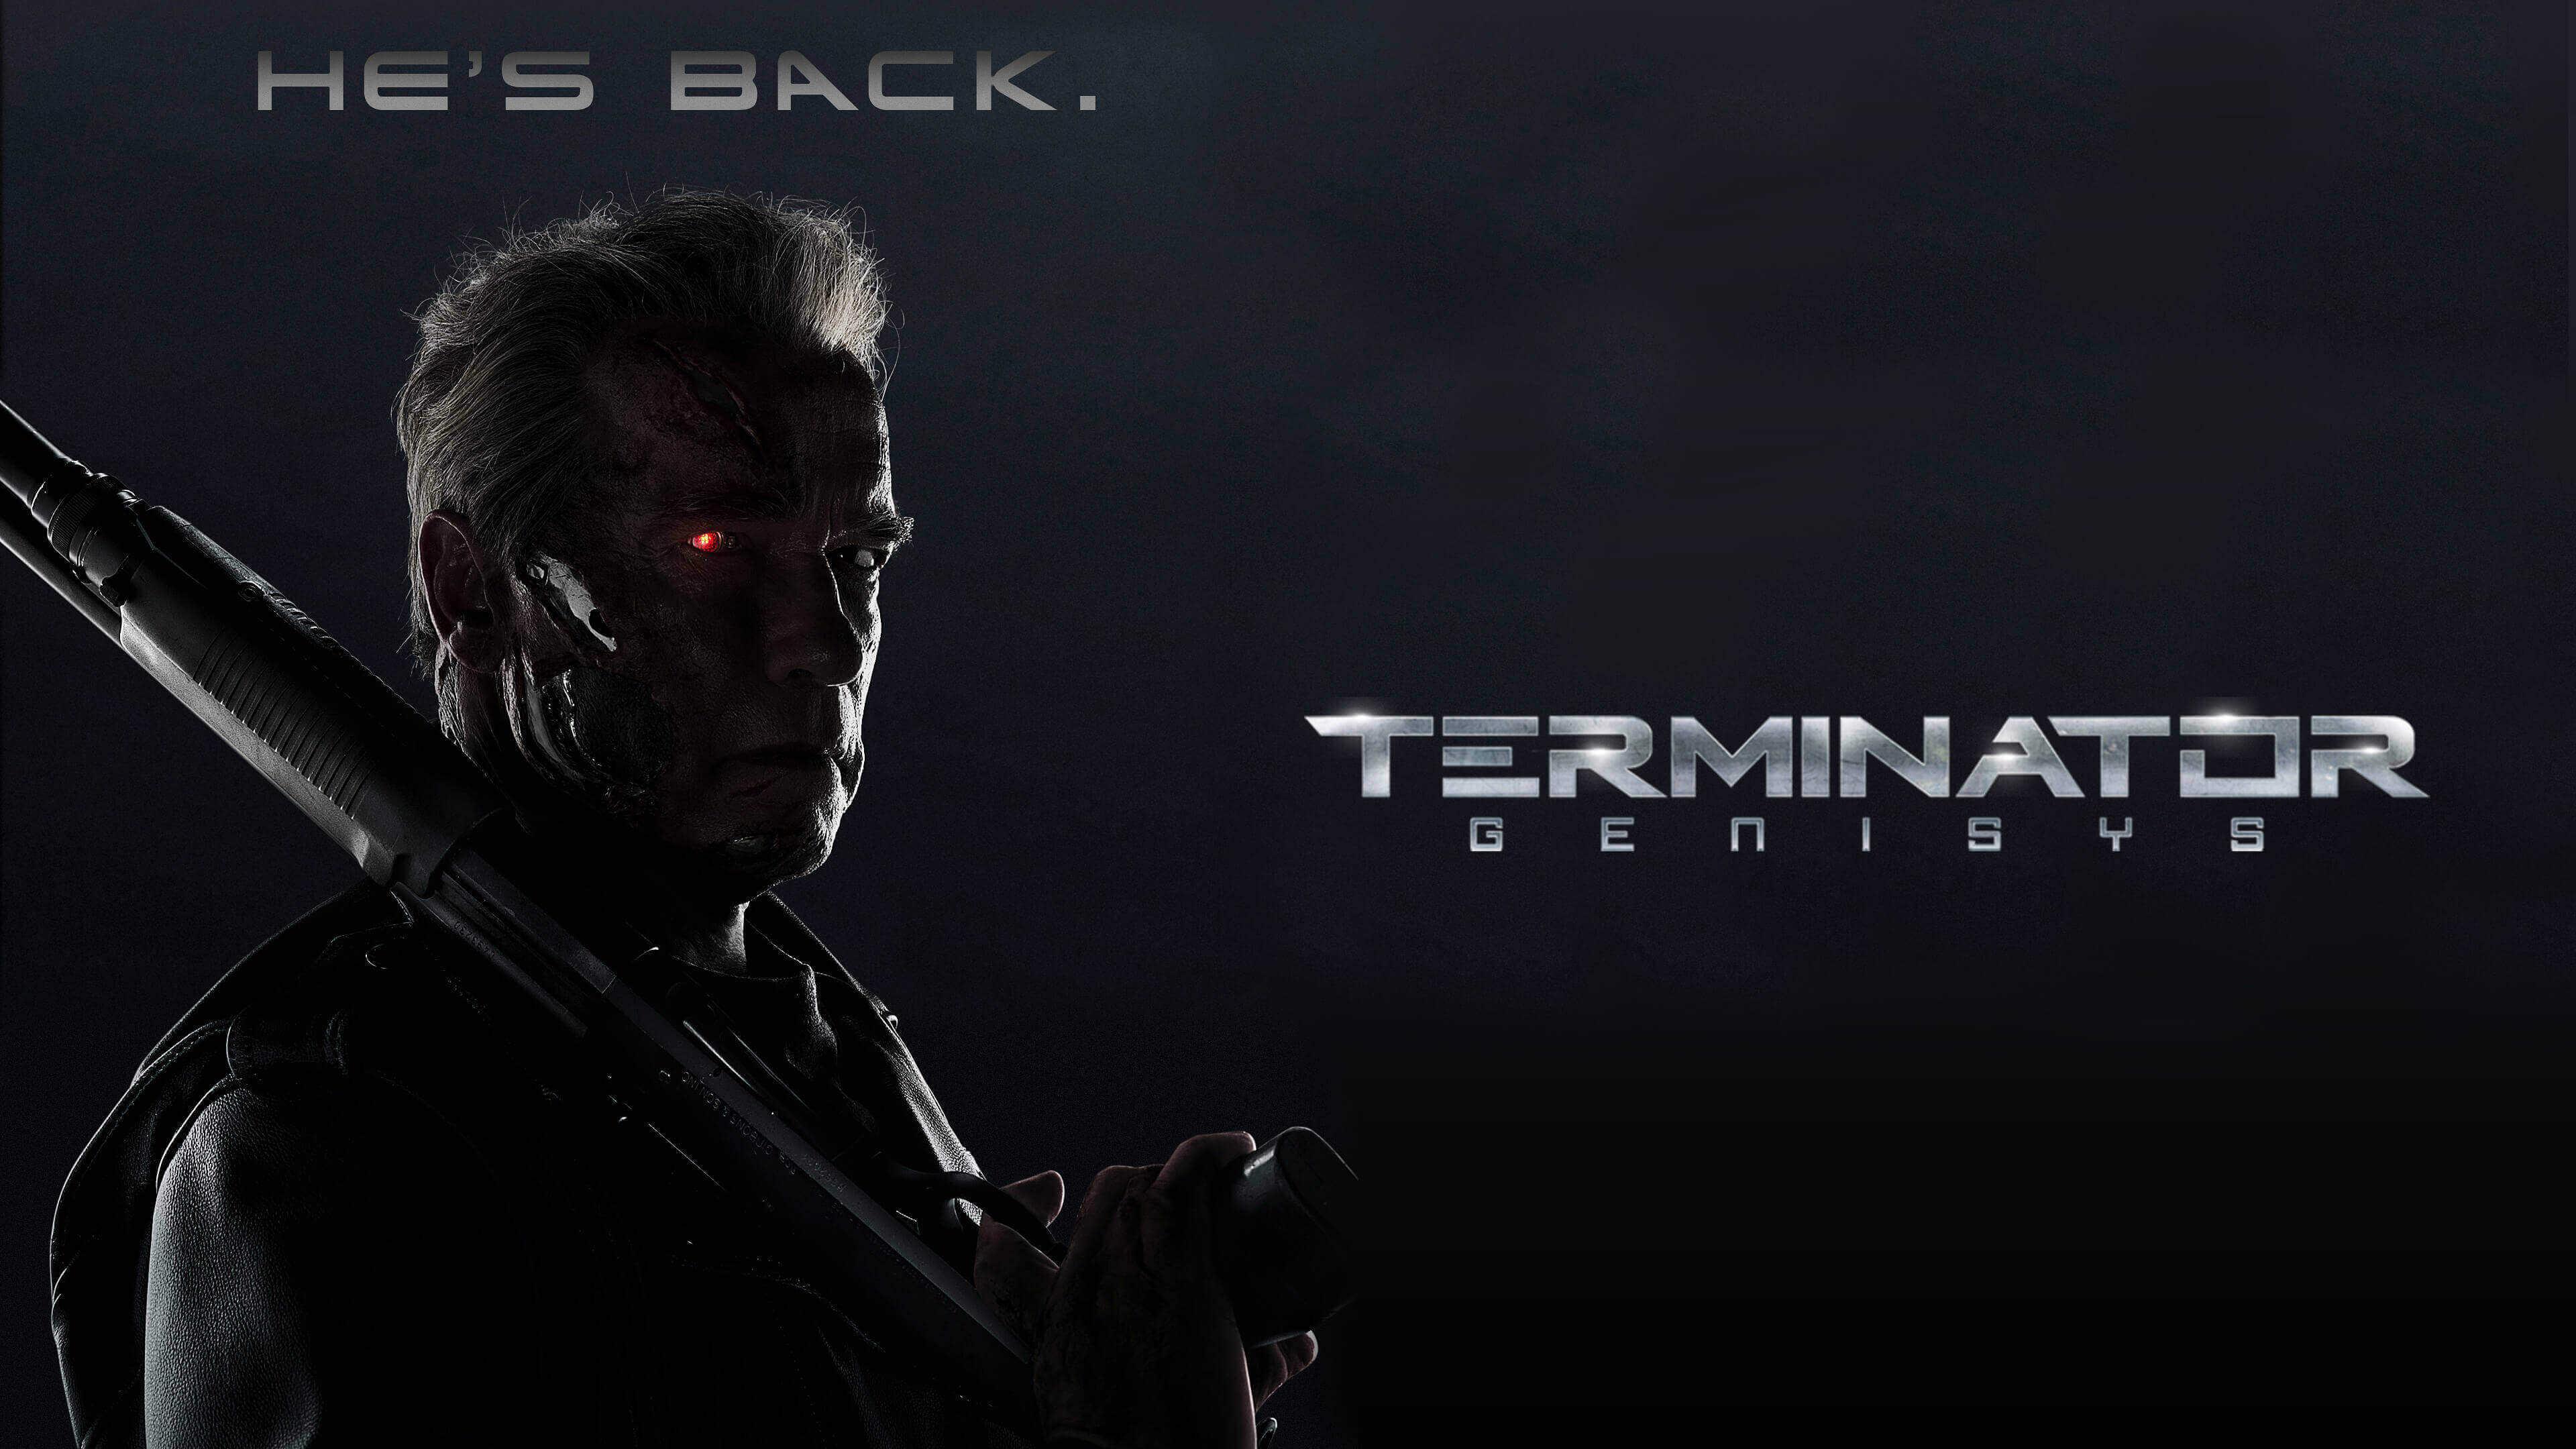 terminator genisys uhd 4k wallpaper